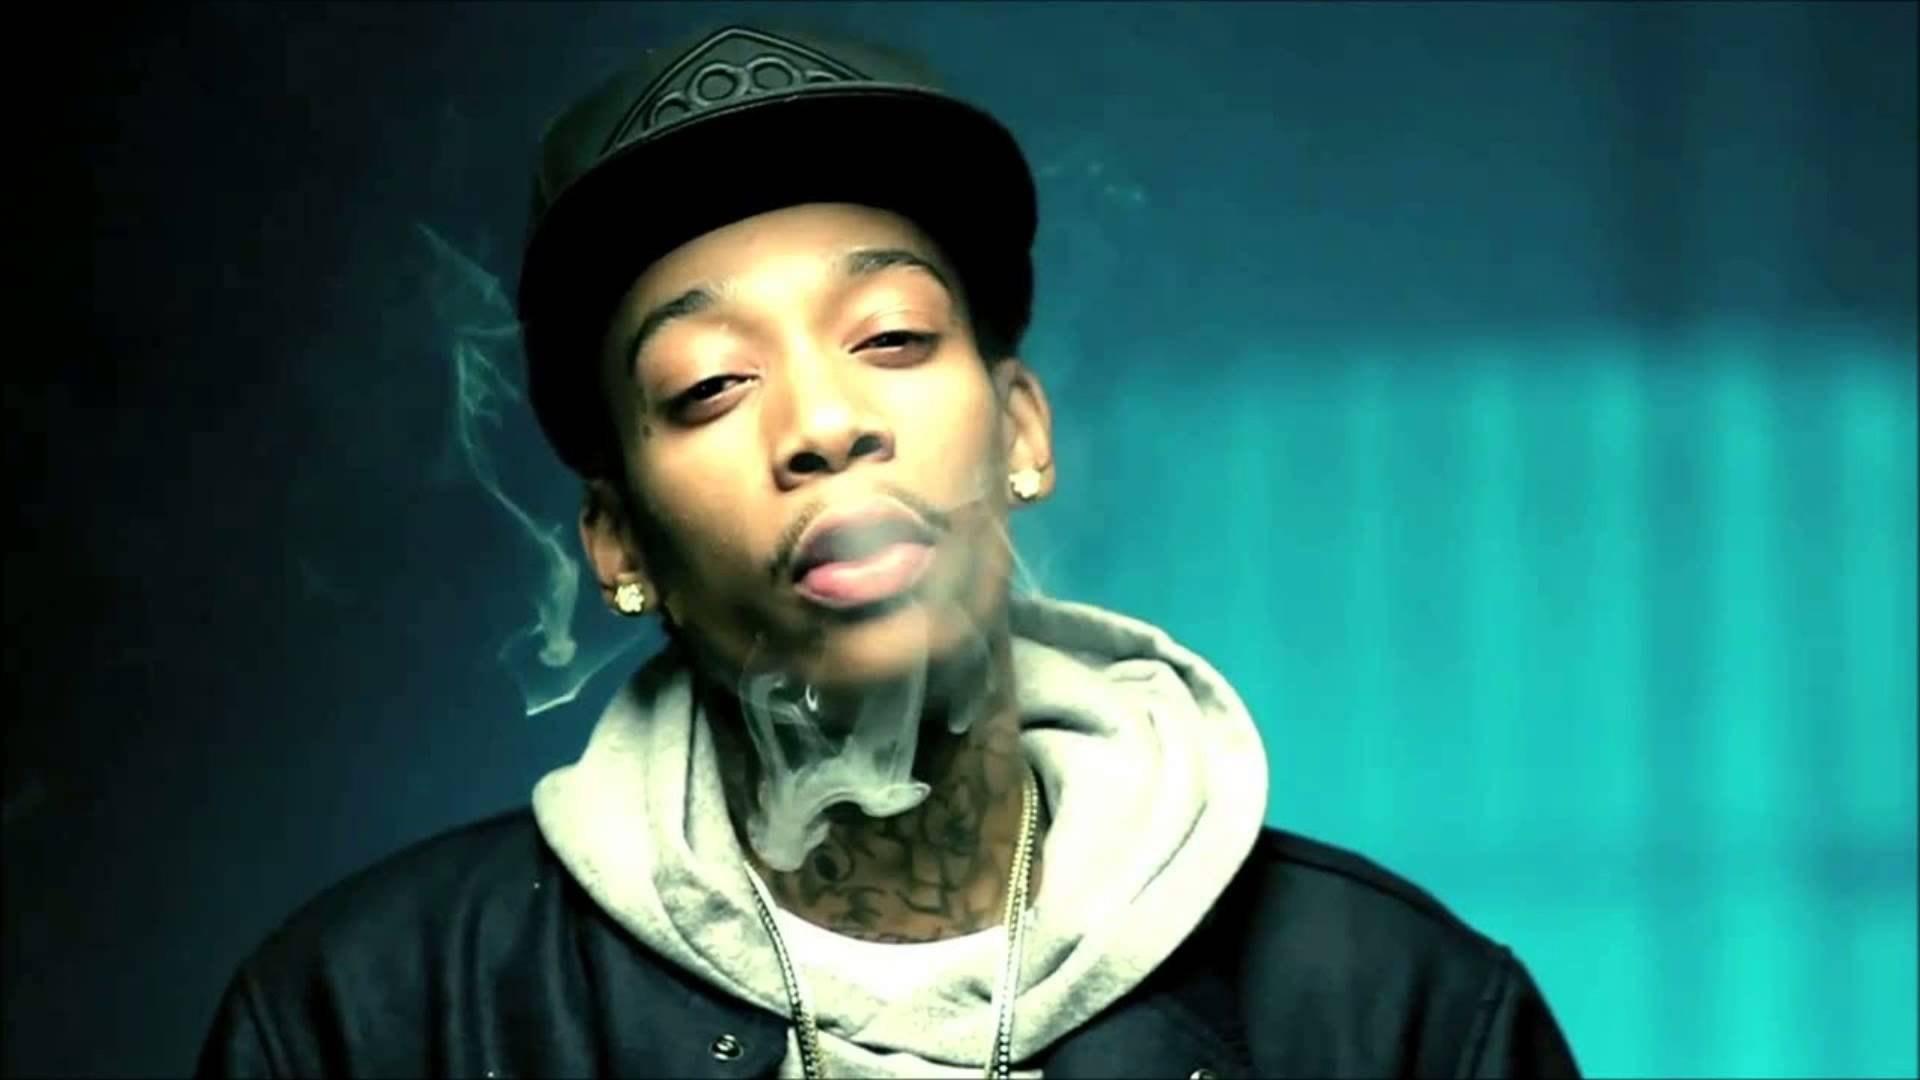 Gangsta Girl Iphone Wallpaper Wiz Khalifa Rap Rapper Hip Hop Gangsta 1wizk Weed Drugs